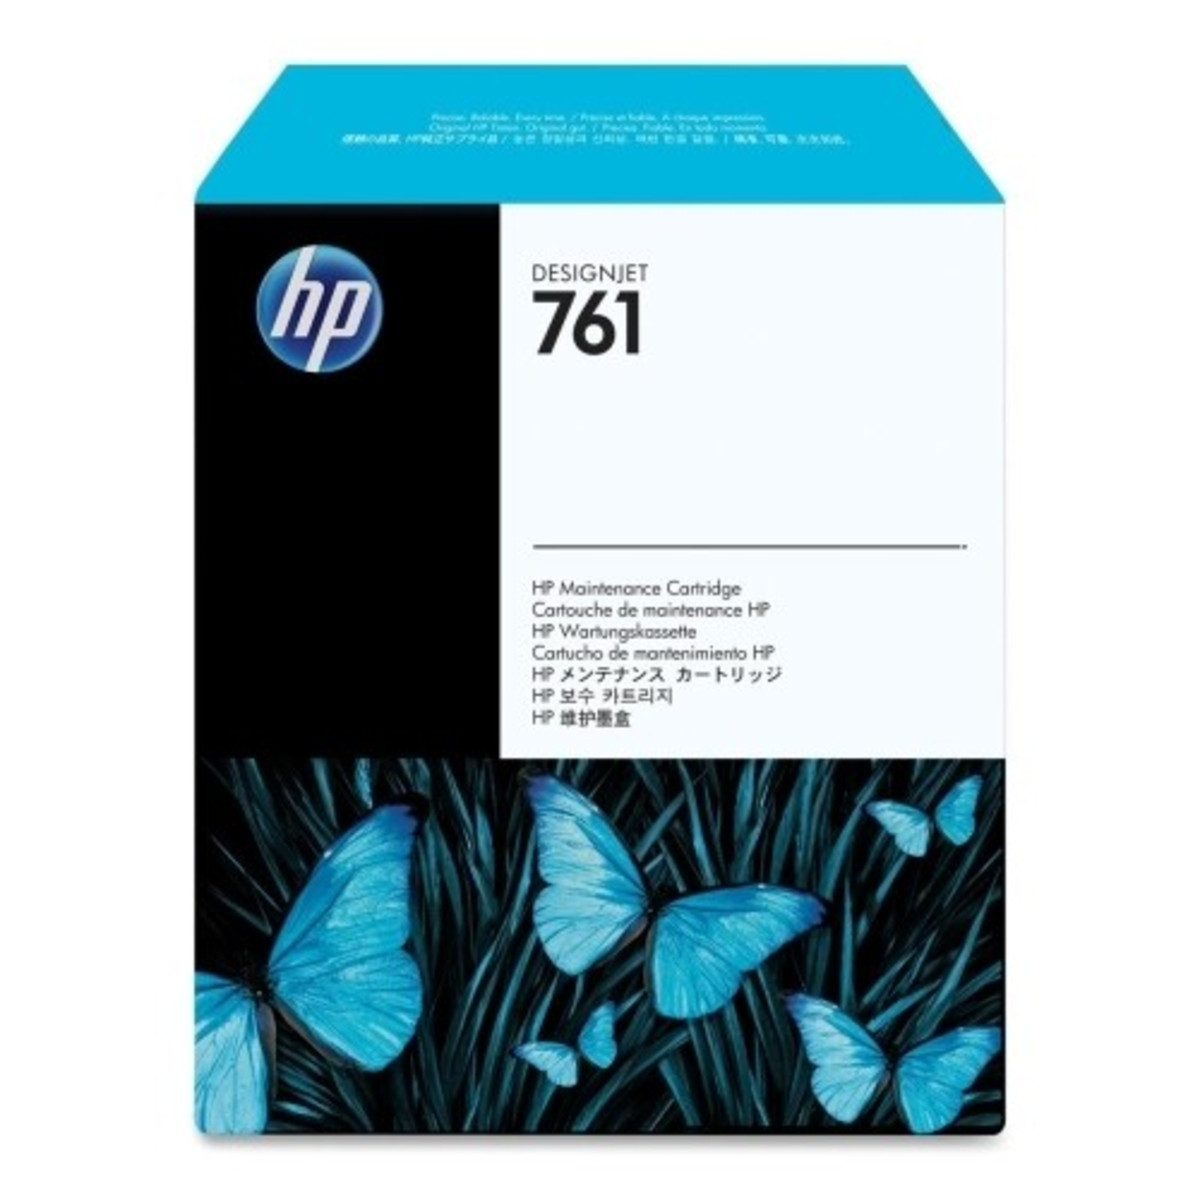 HP 761 (CH649A) Maintenance Cartridge